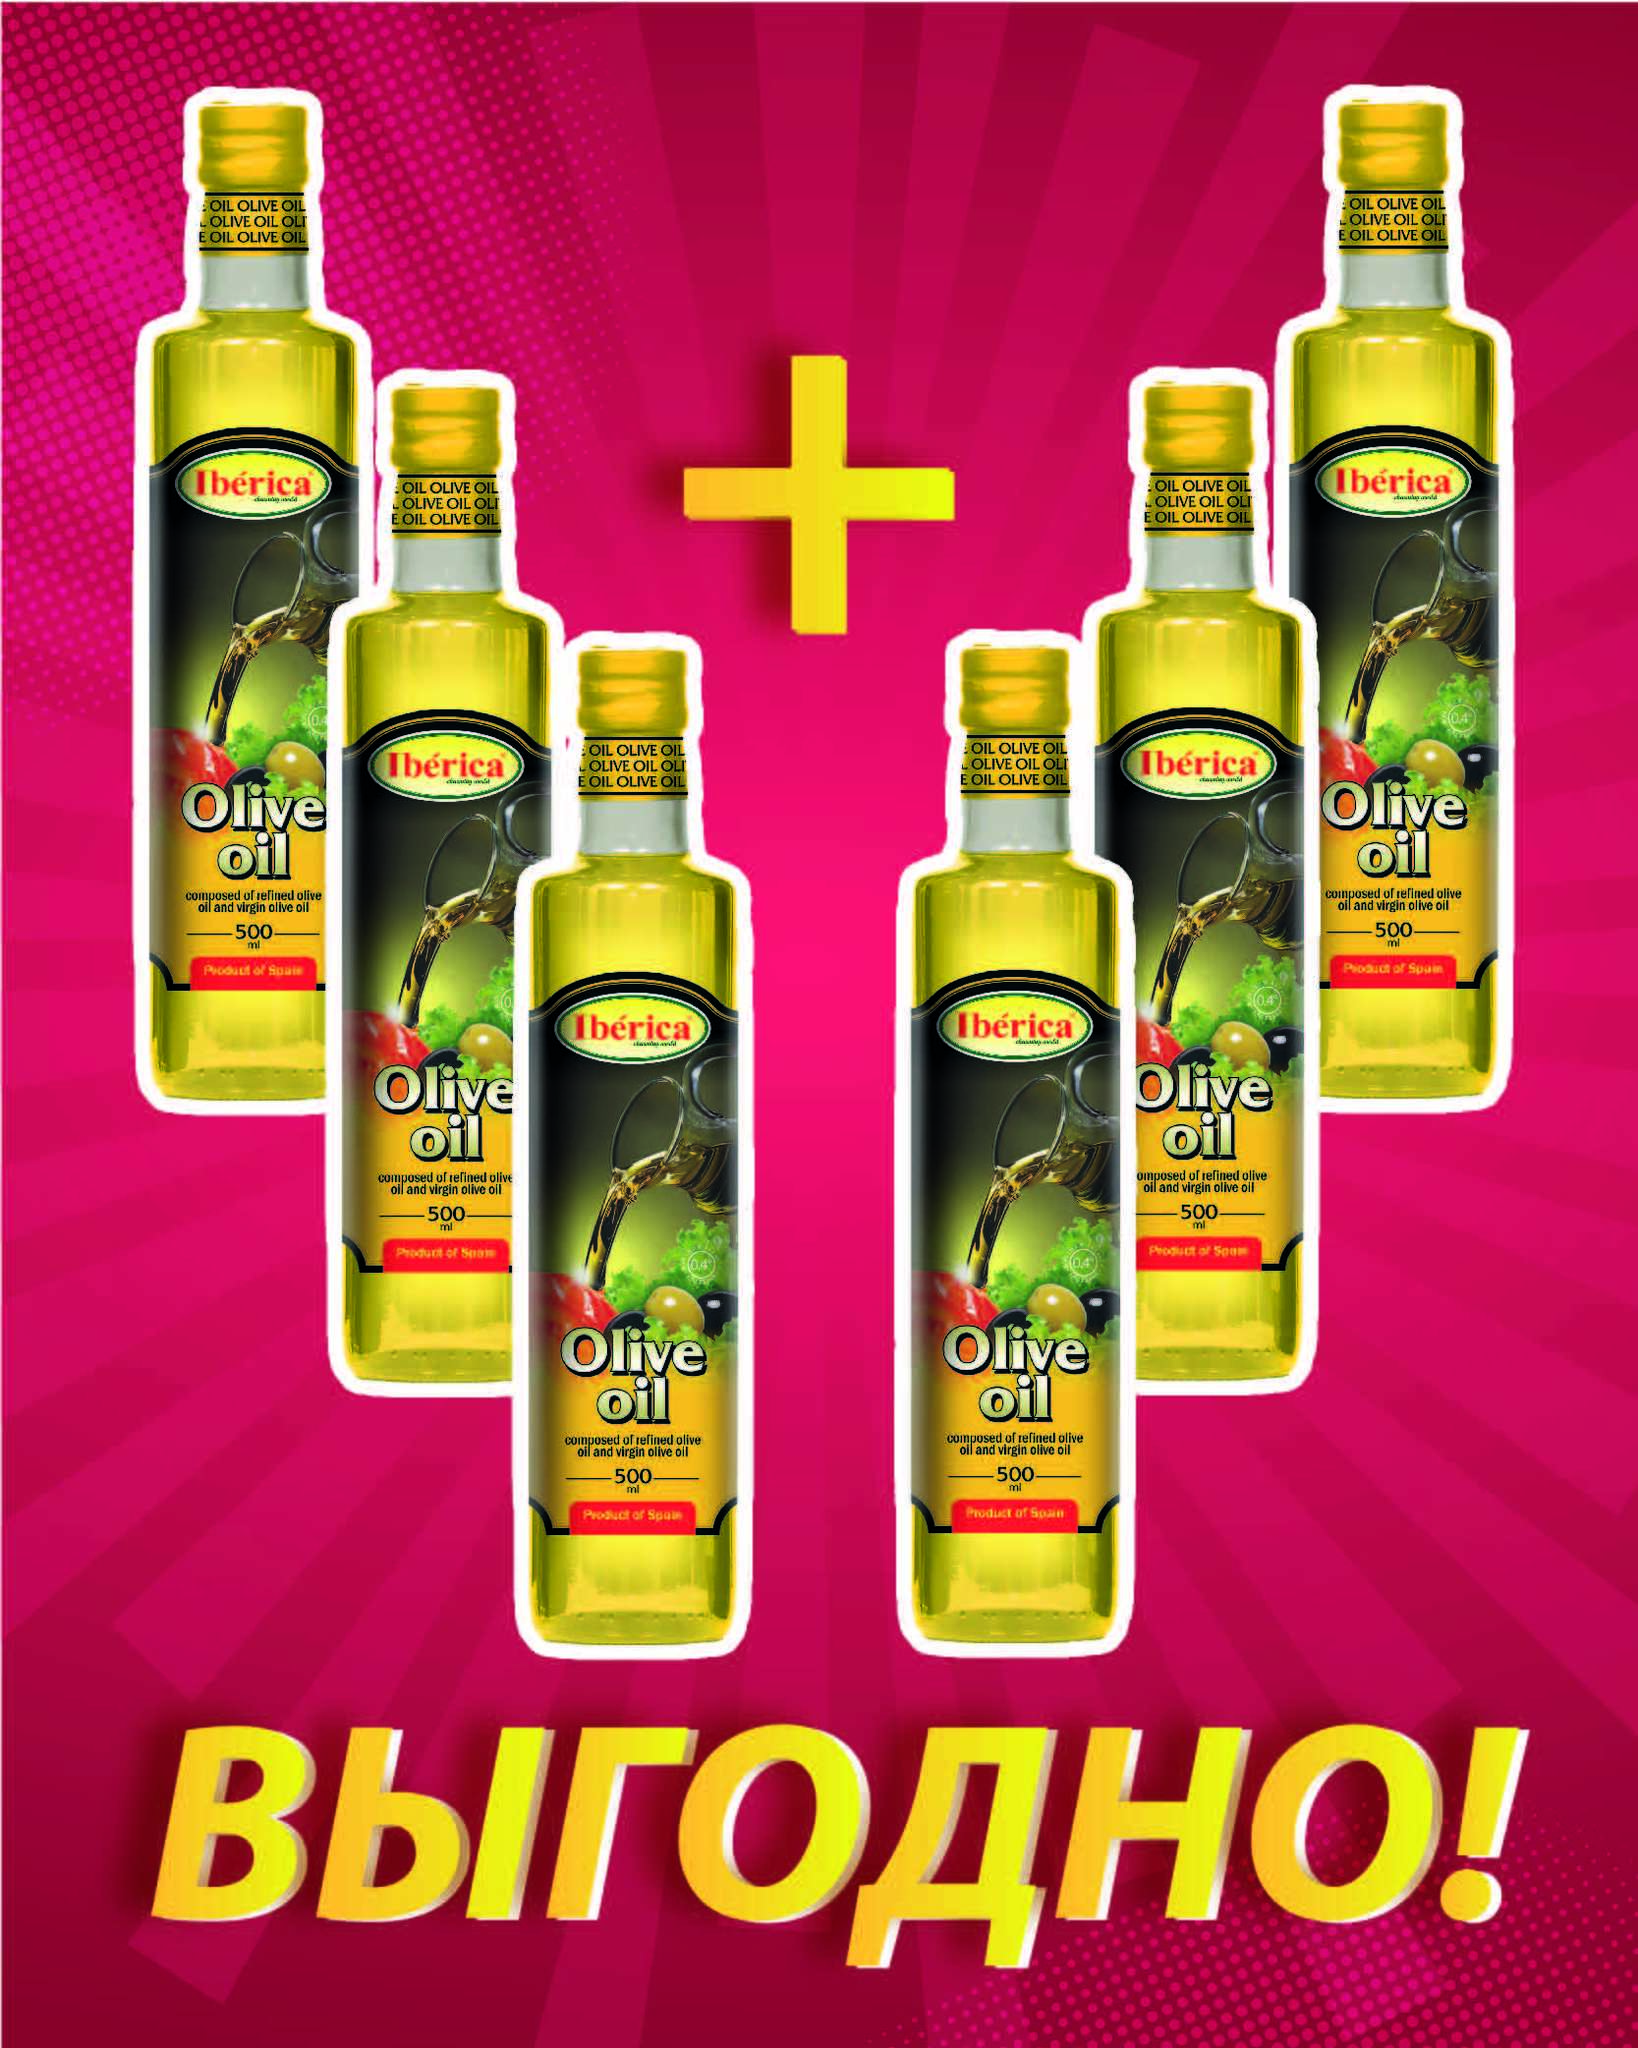 Набор Оливкового масла Iberica 100% 0,5л. из 6 шт.